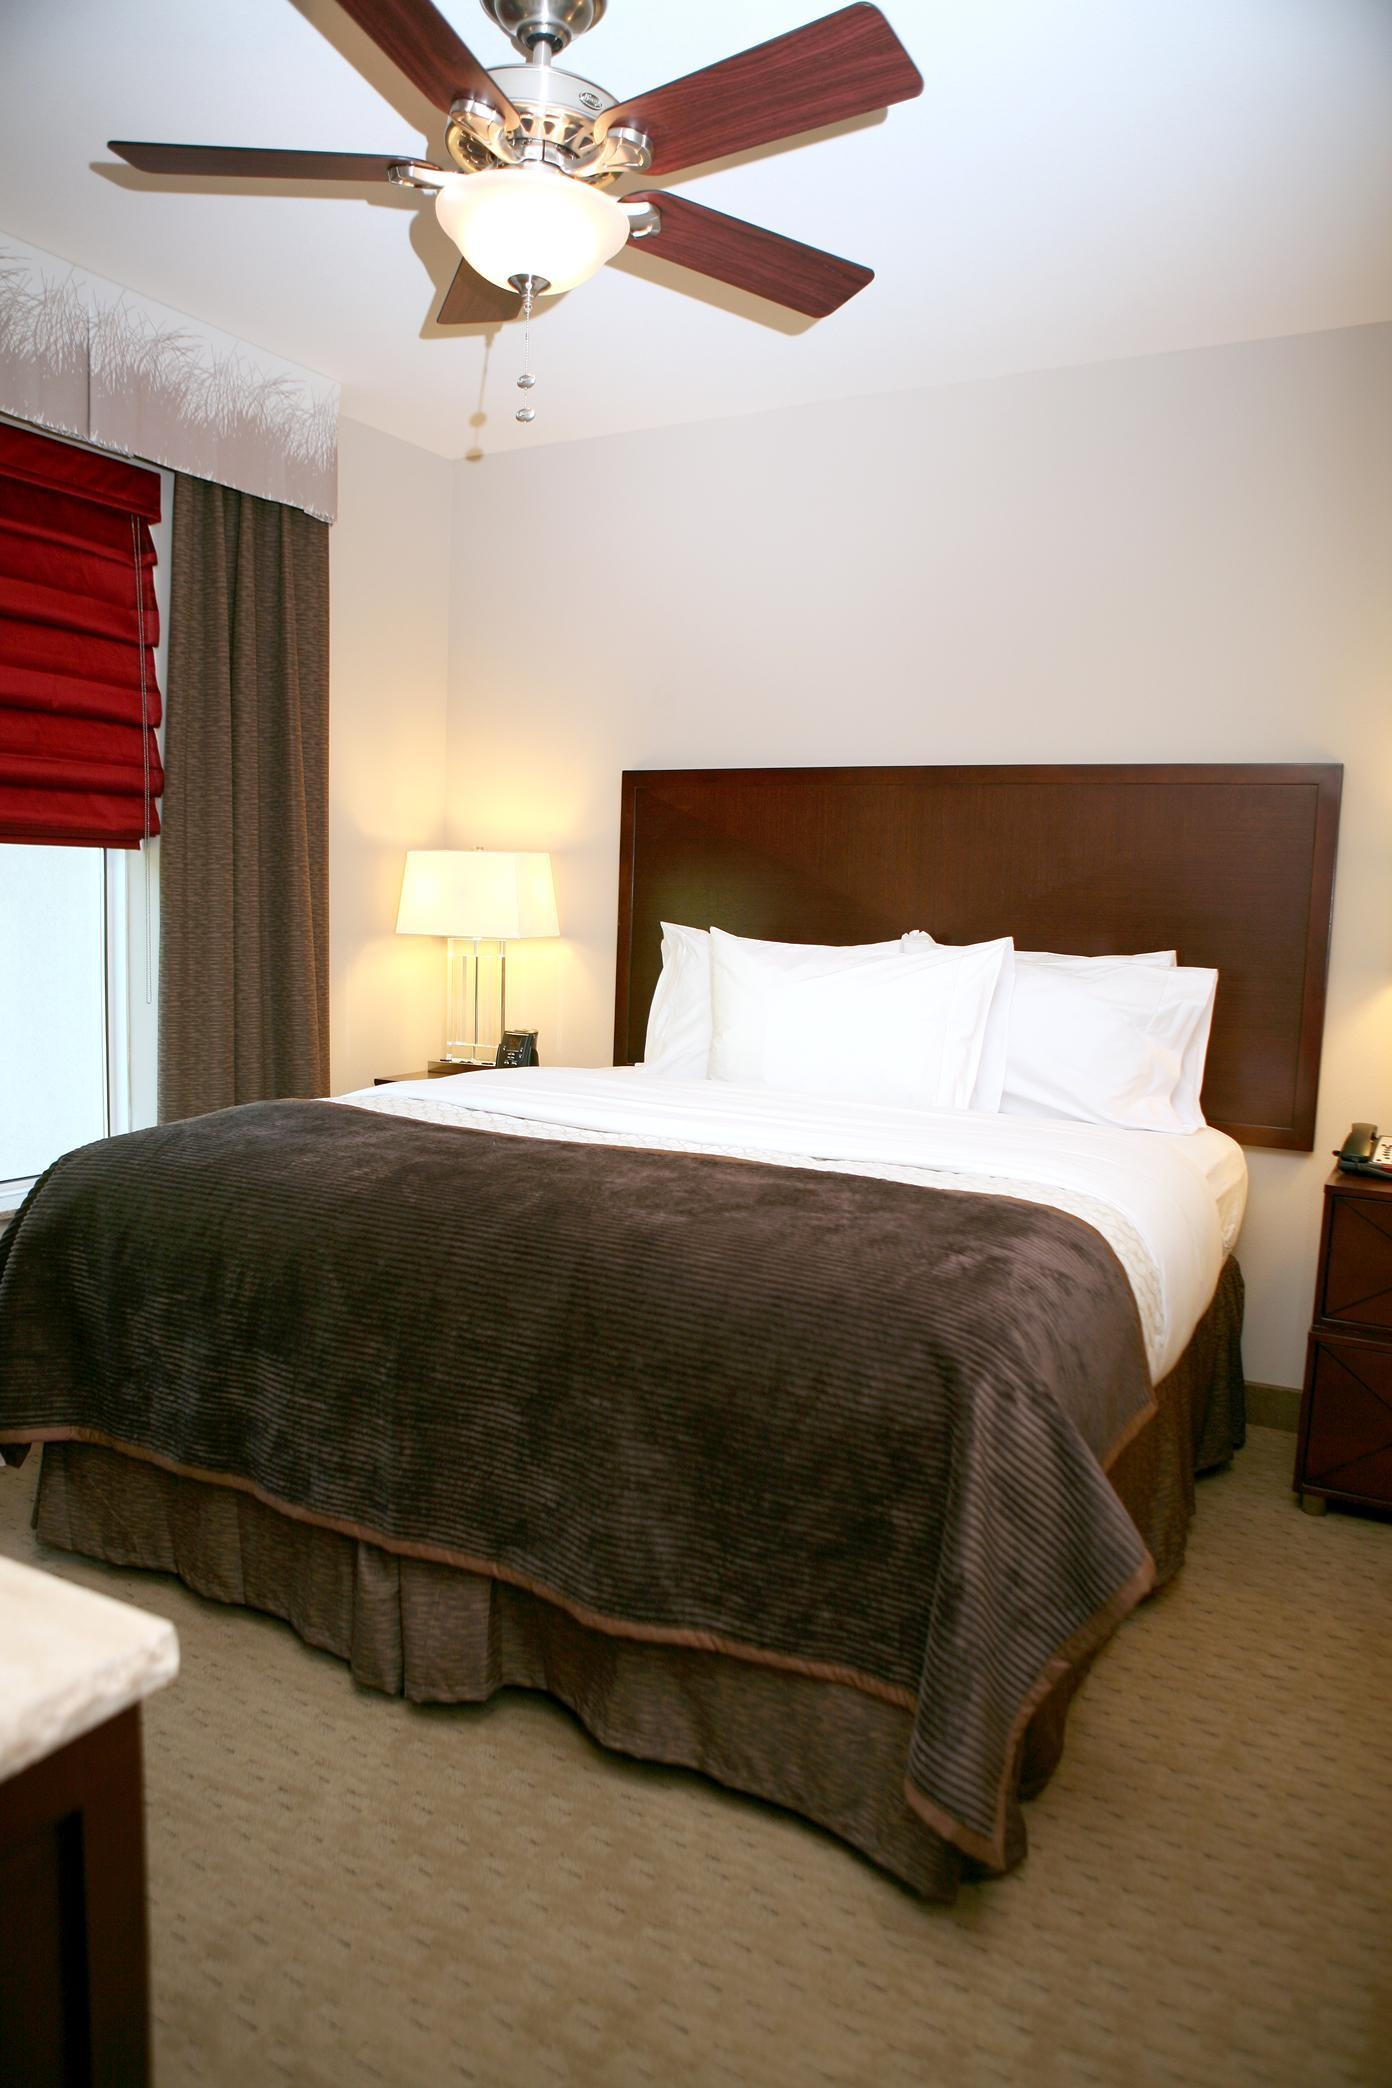 Embassy Suites by Hilton Birmingham Hoover image 29